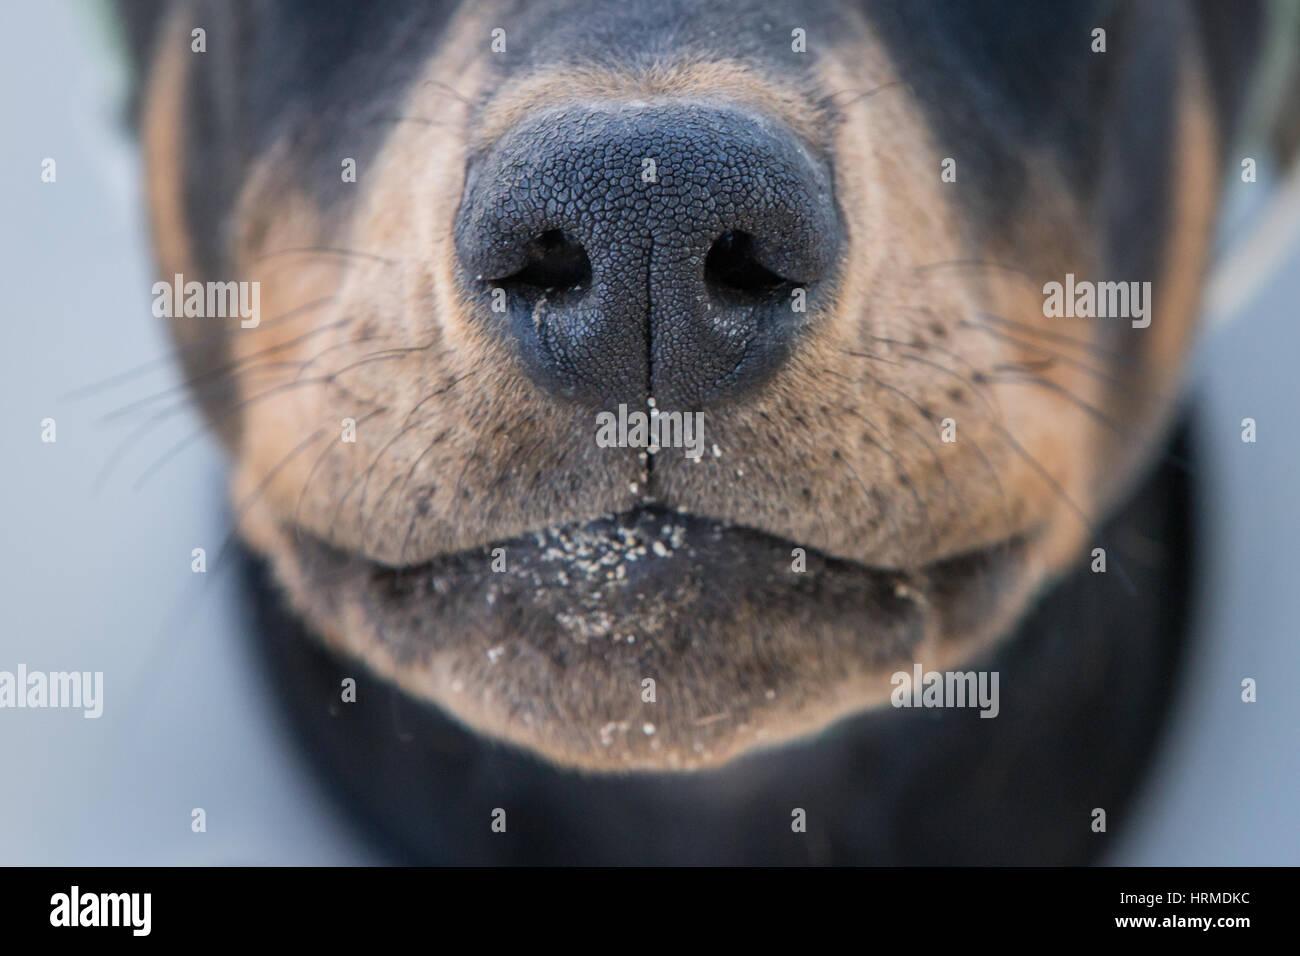 The nose of a doberman pinscher, - Stock Image